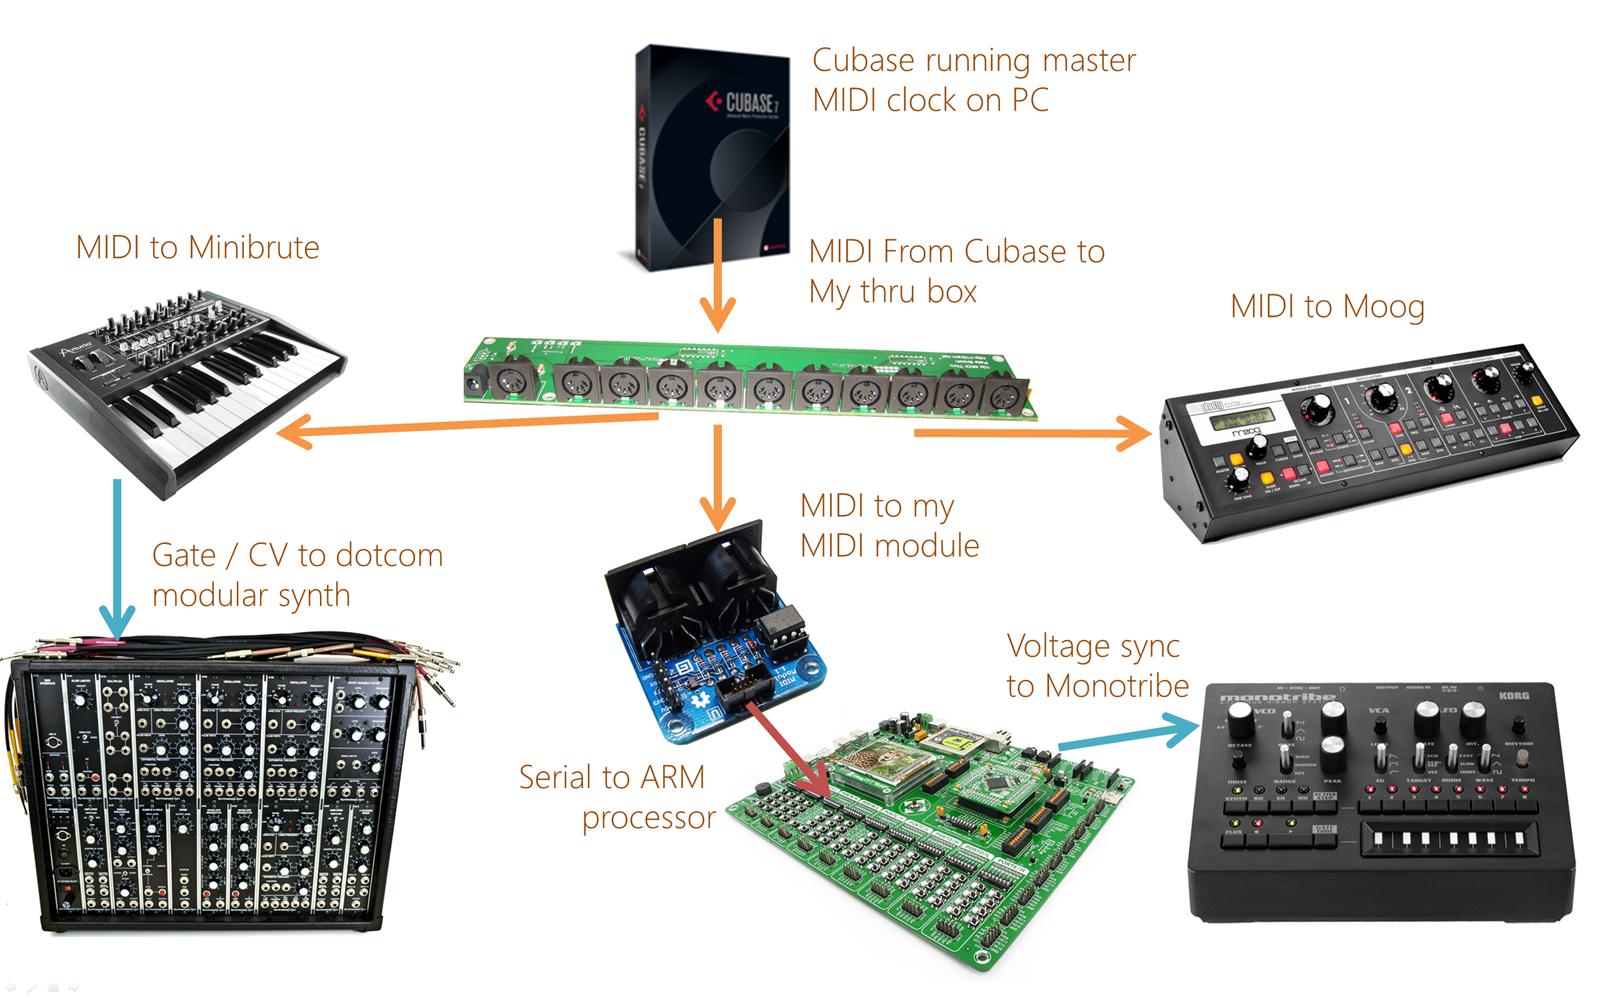 A MIDI clock pulse to analog sync voltage converter